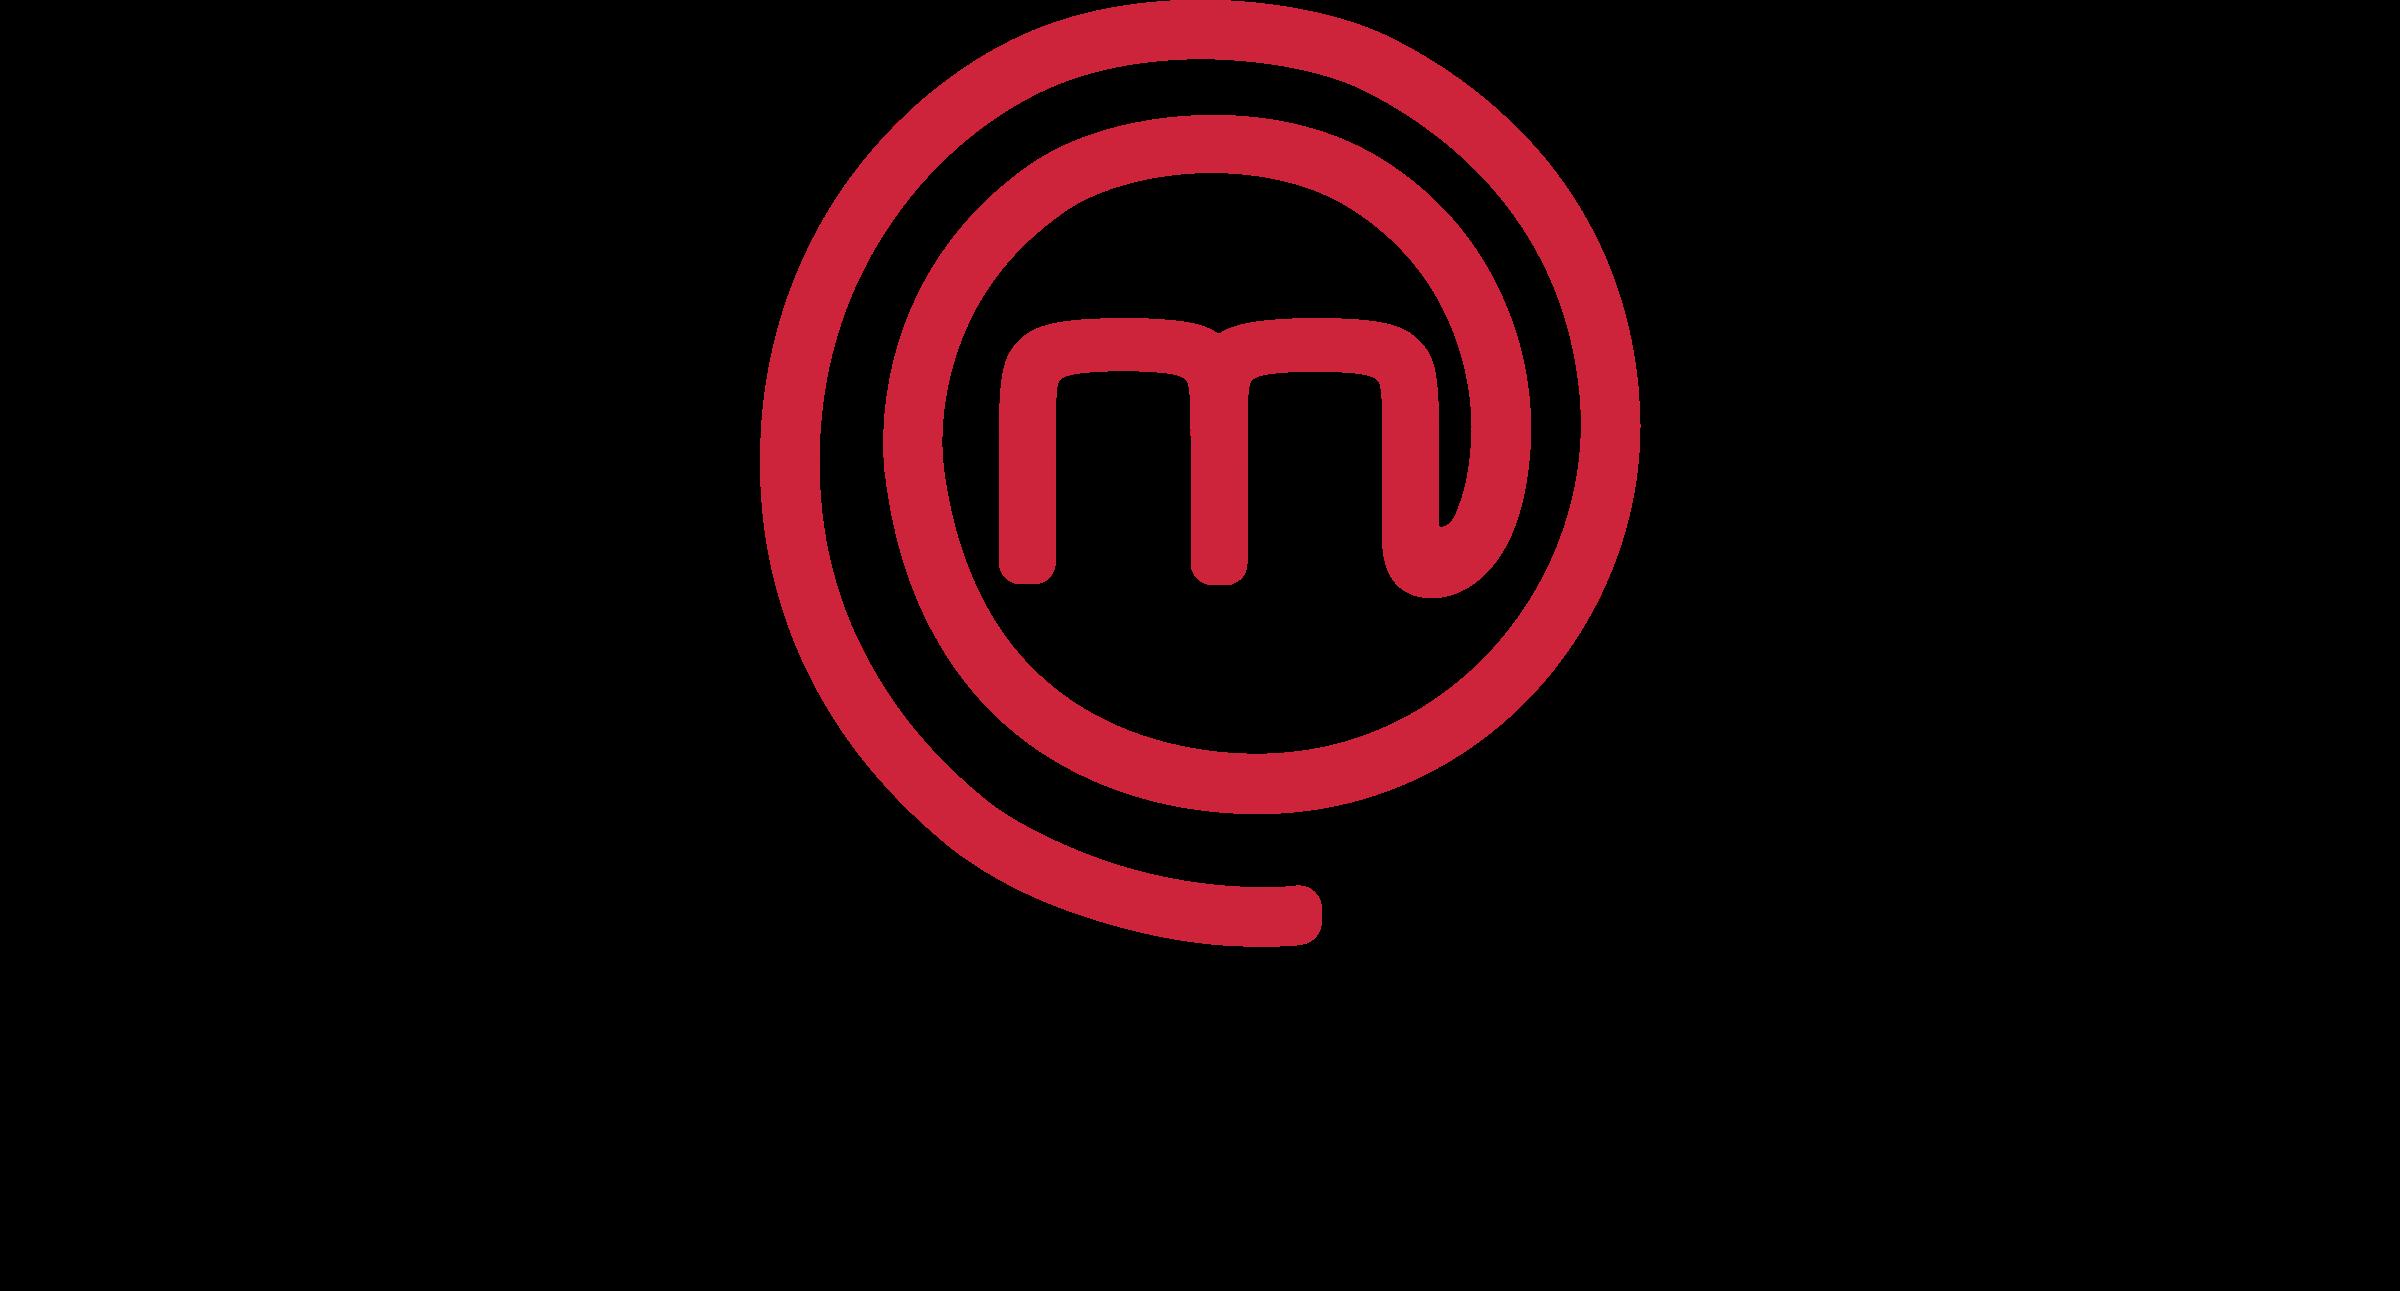 masterchef-logo-png-transparent